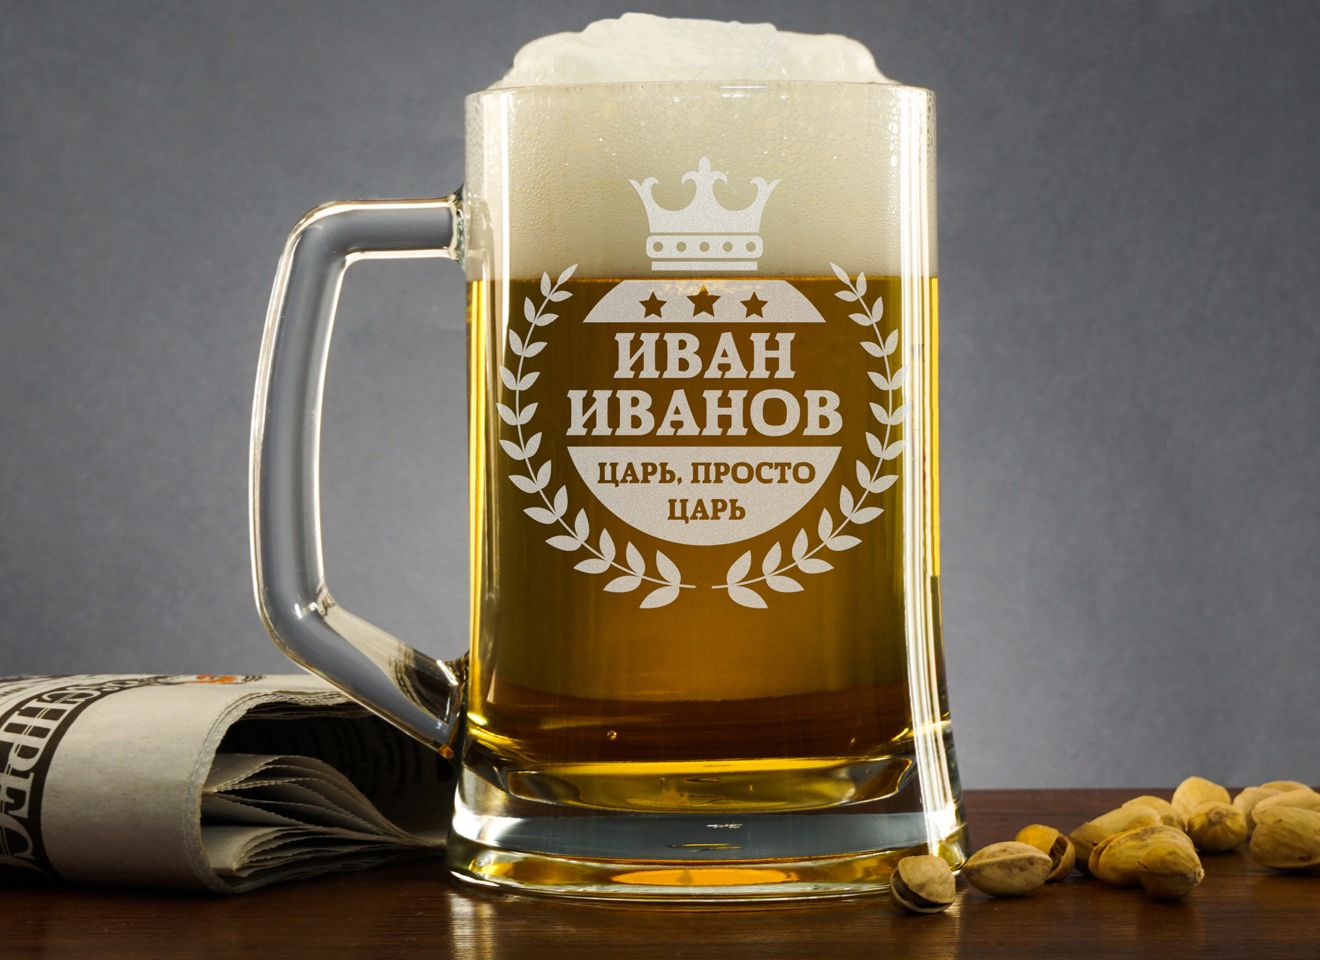 Пивная кружка Царь, просто царь